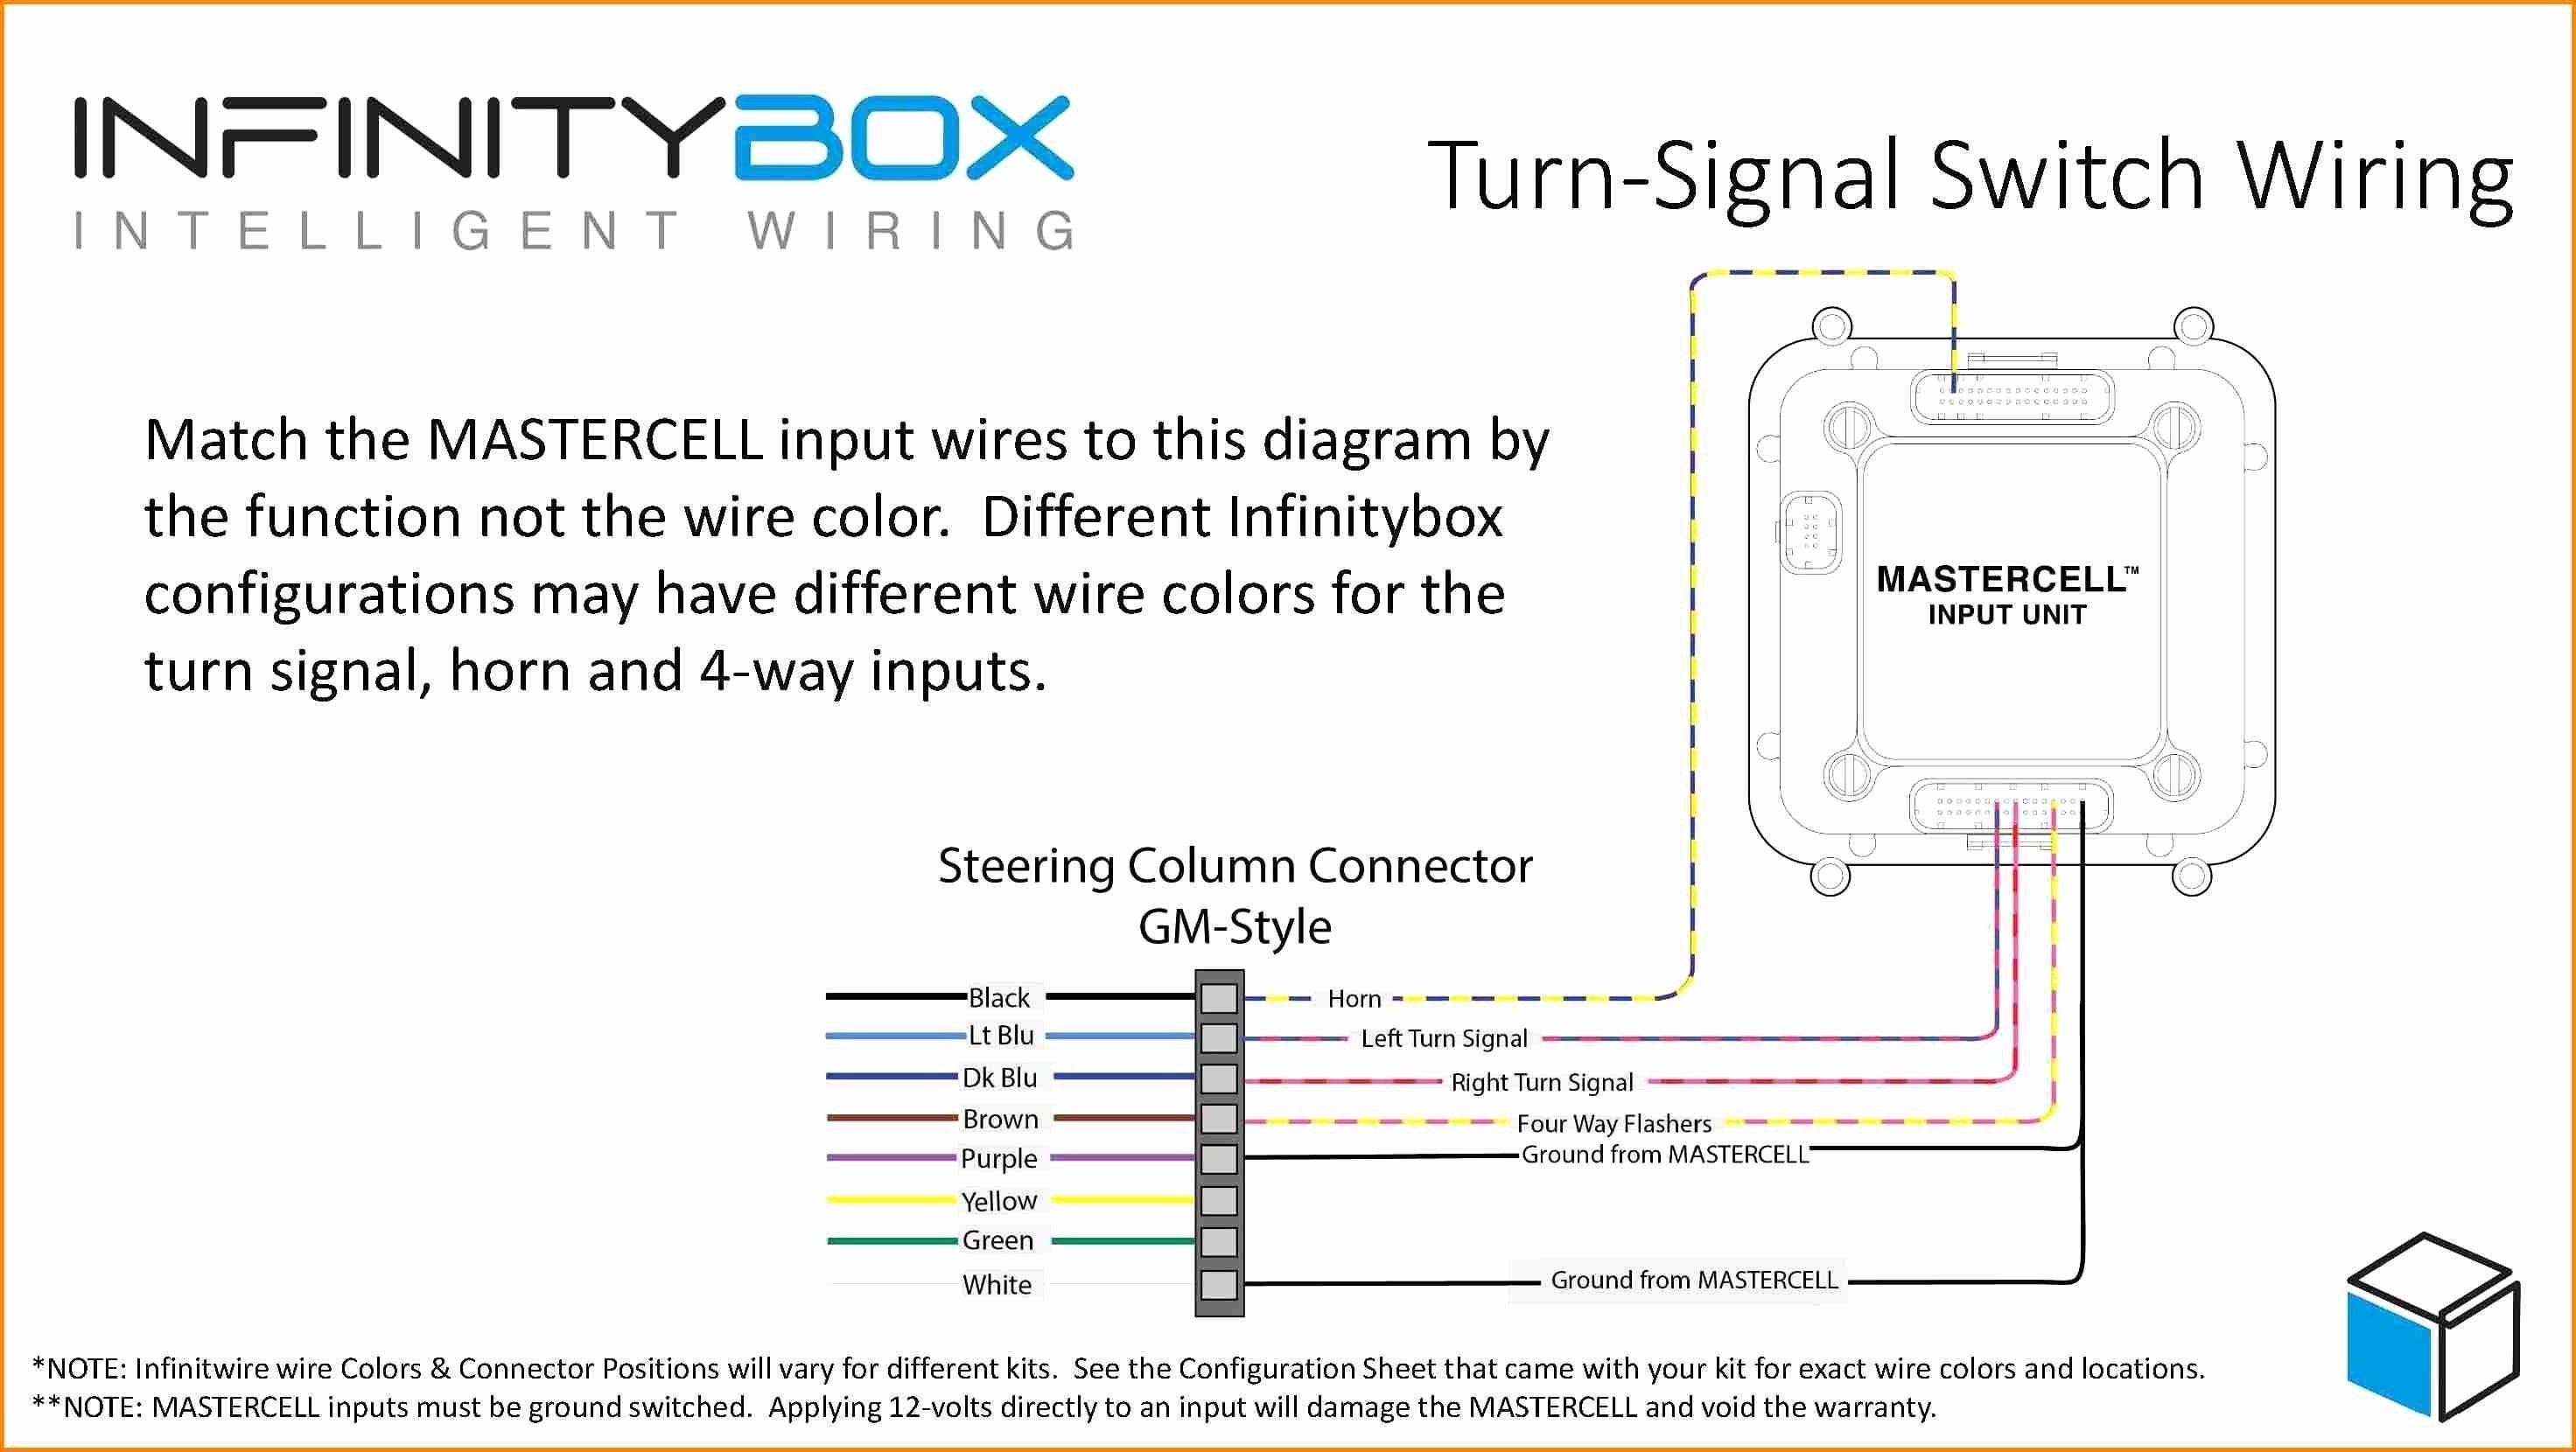 gm audio wiring diagram new bmw f20 audio wiring diagram new bmw  steering column  diagram  new bmw f20 audio wiring diagram new